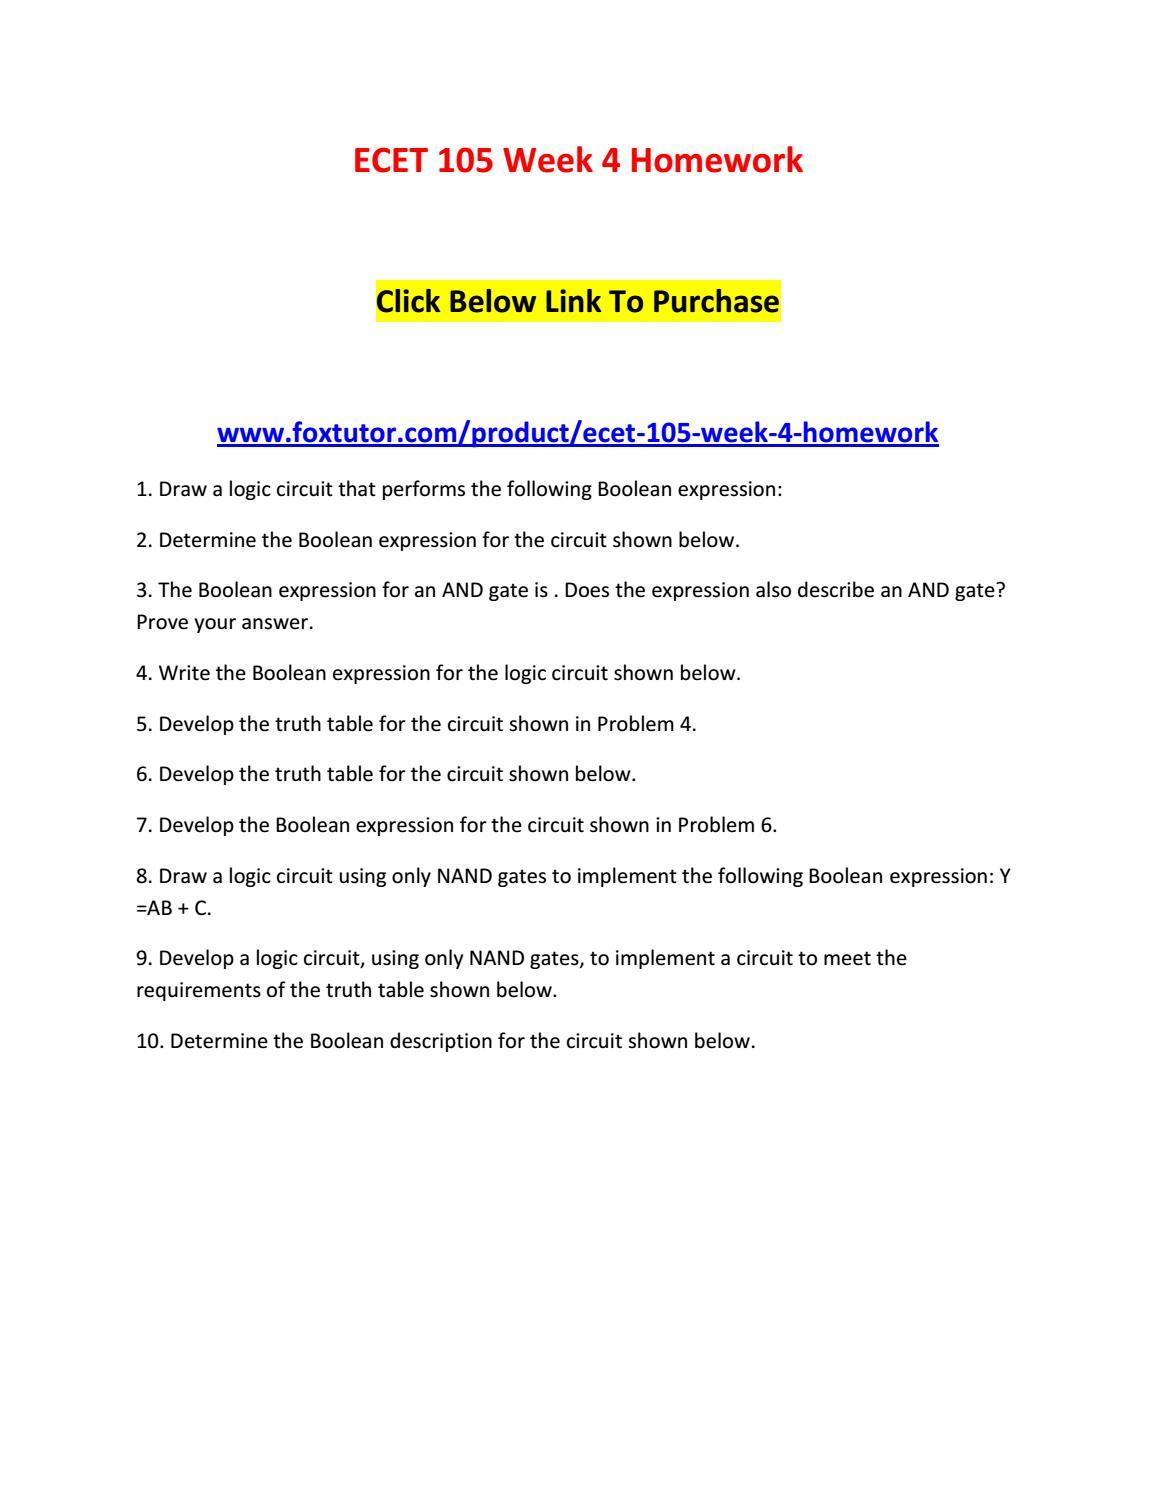 Ecet 105 Week 4 Homework By Ecet105ft Issuu Logic Diagram Using Nand Gates Only